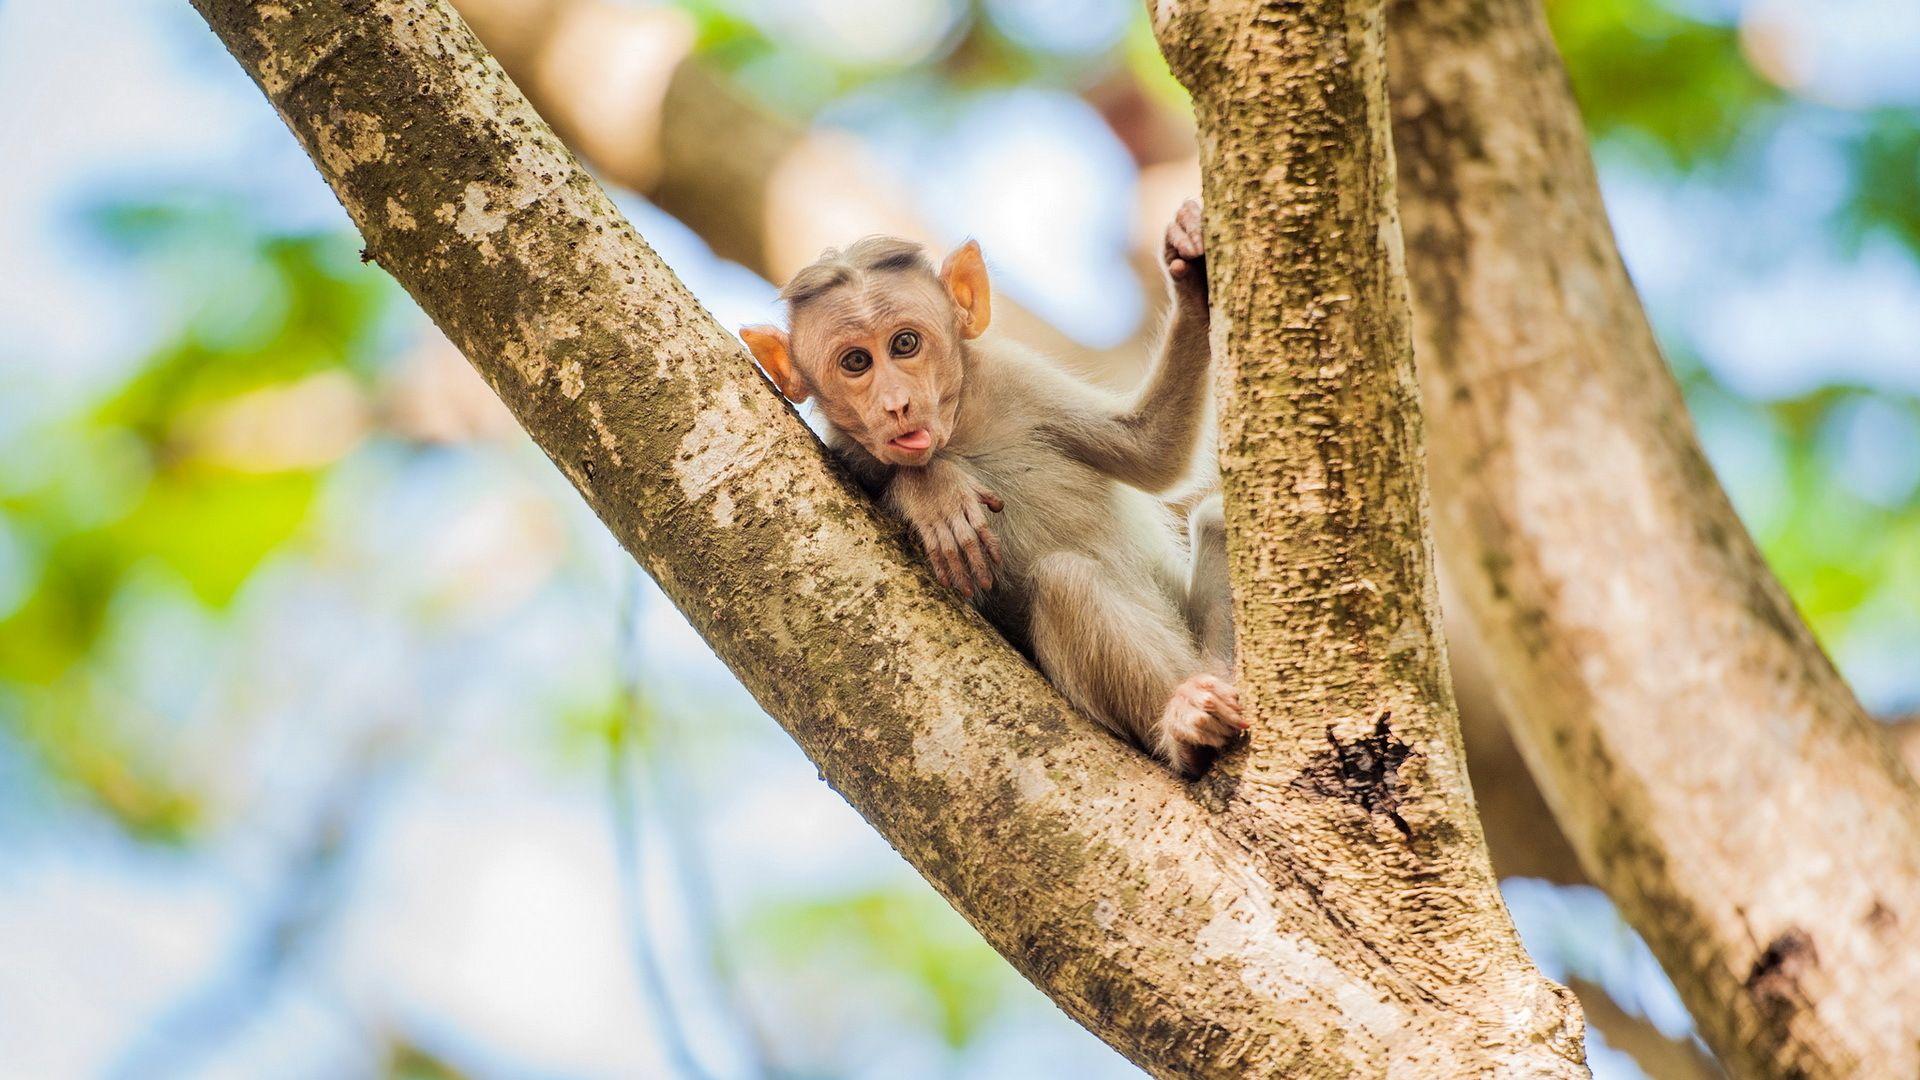 Wallpaper Desktop Monkey